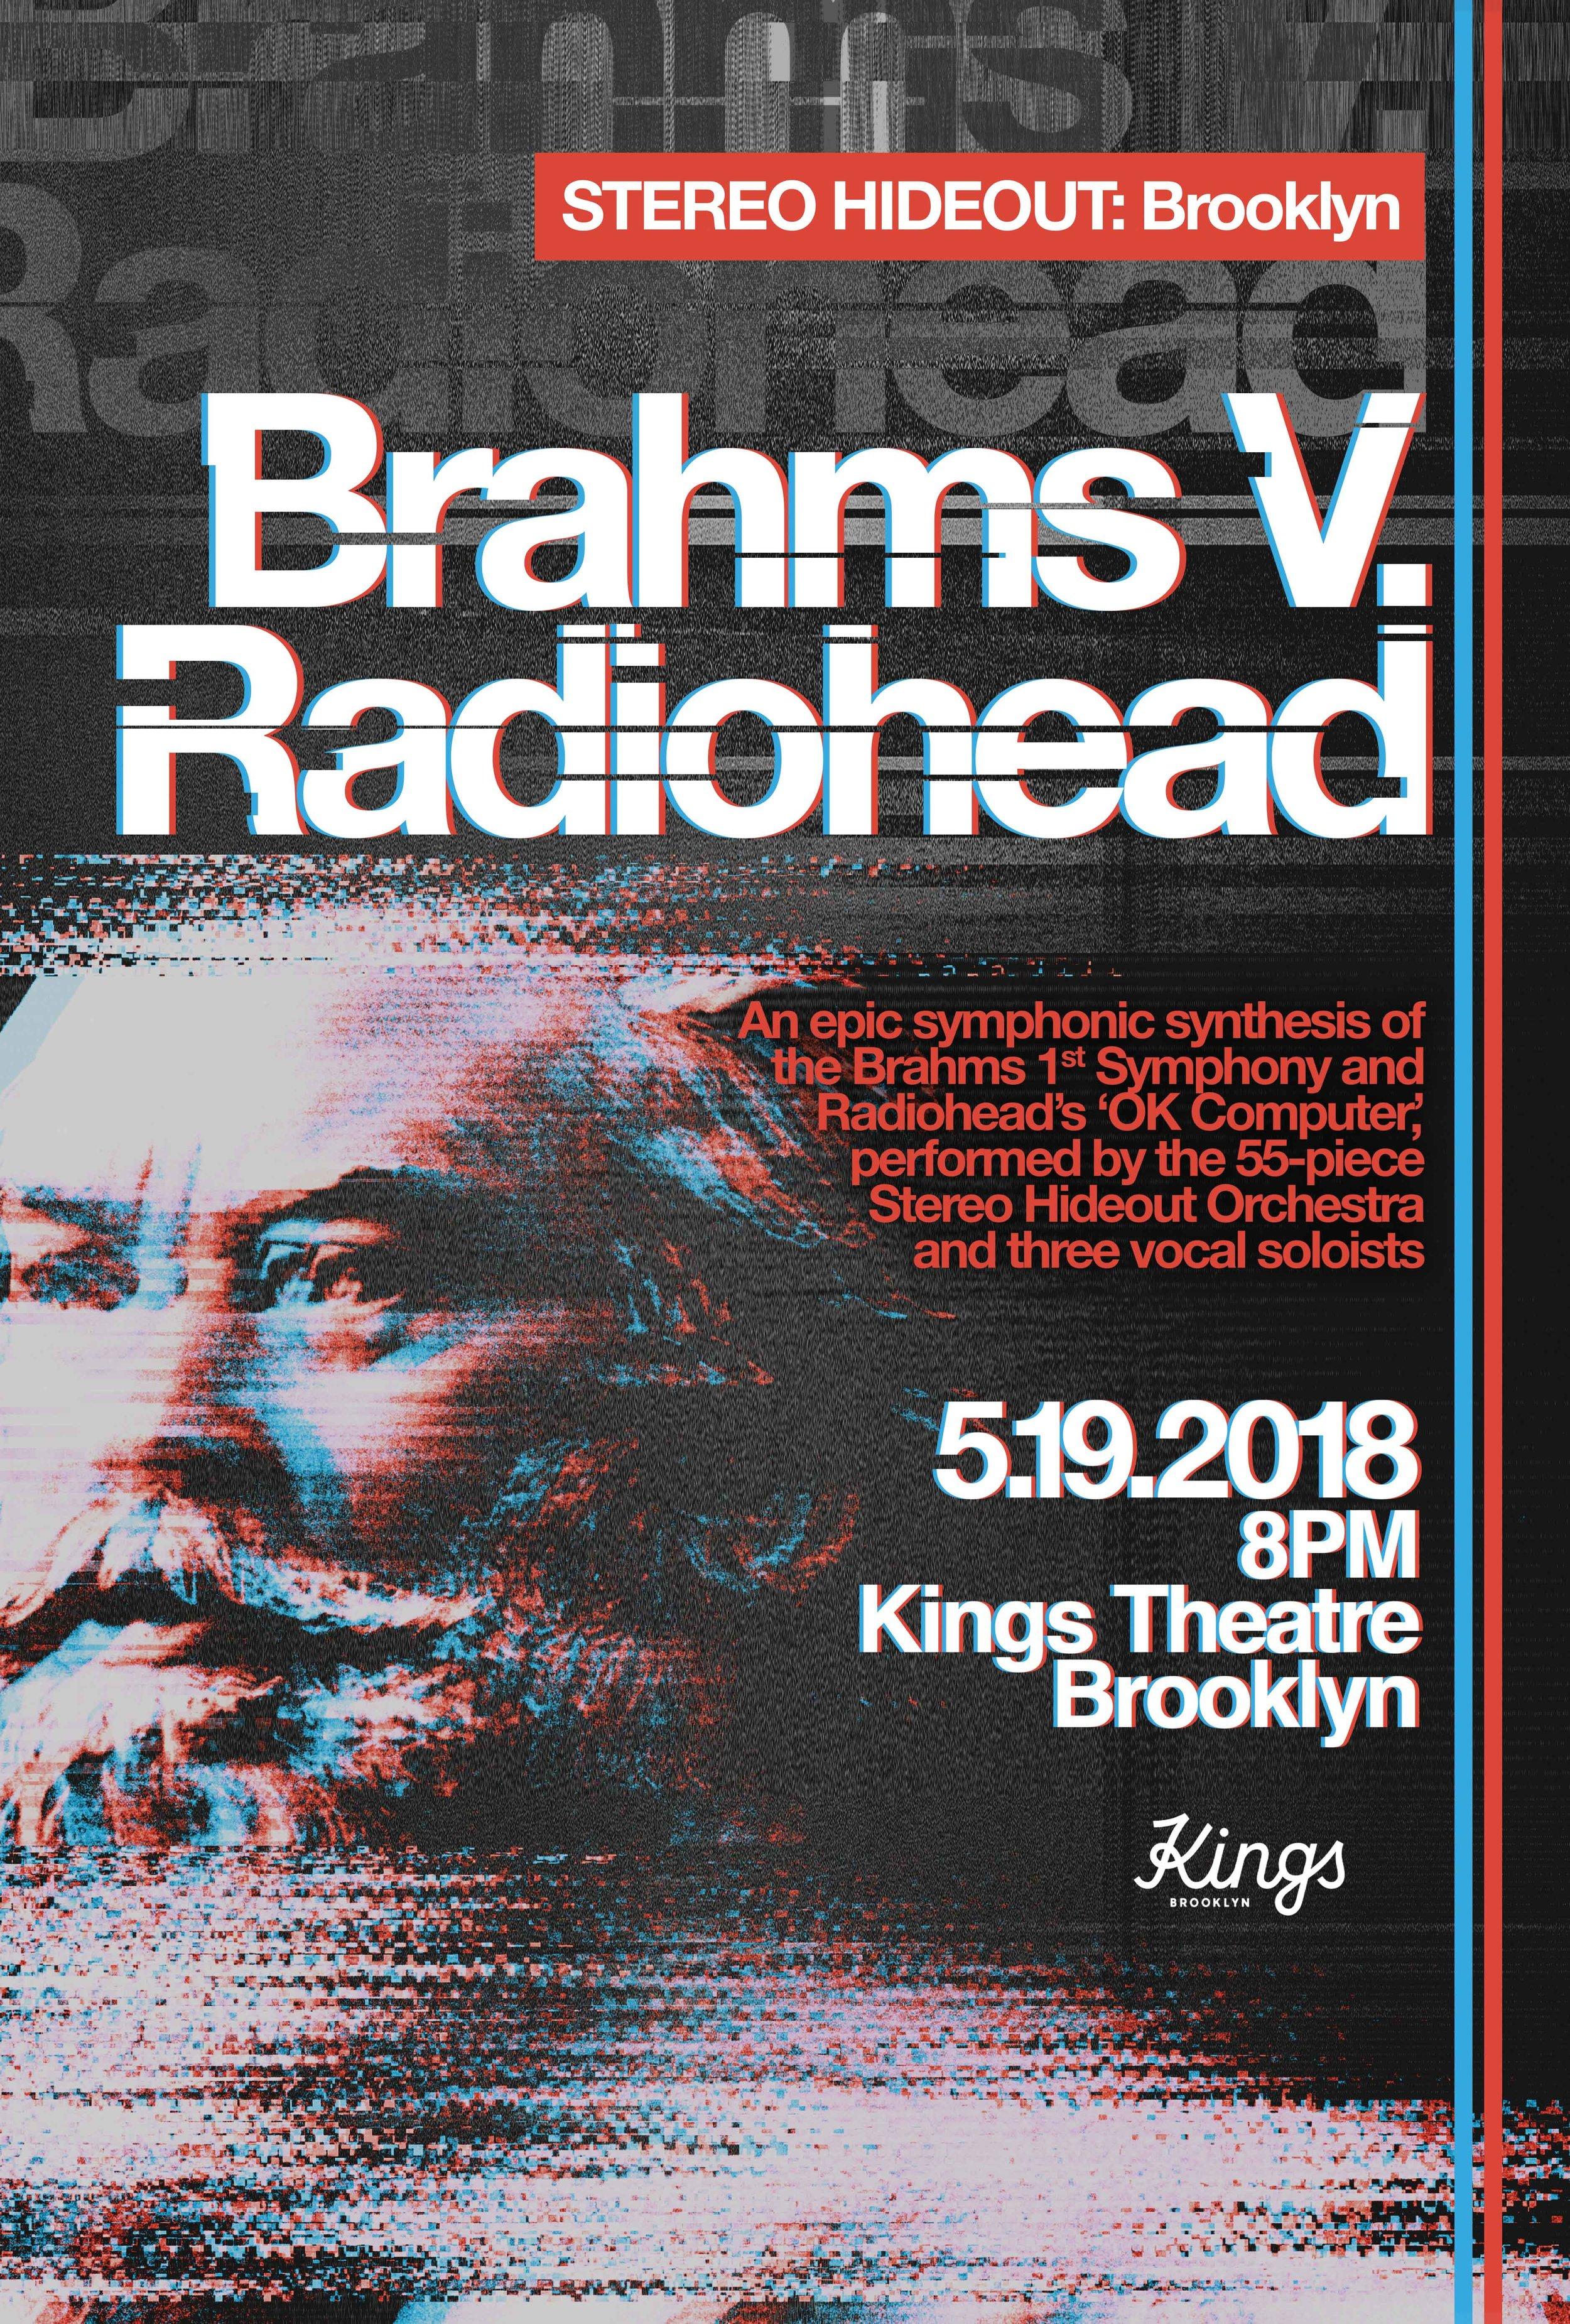 Brahms-V-Radiohead-poster-RGB1low.jpg